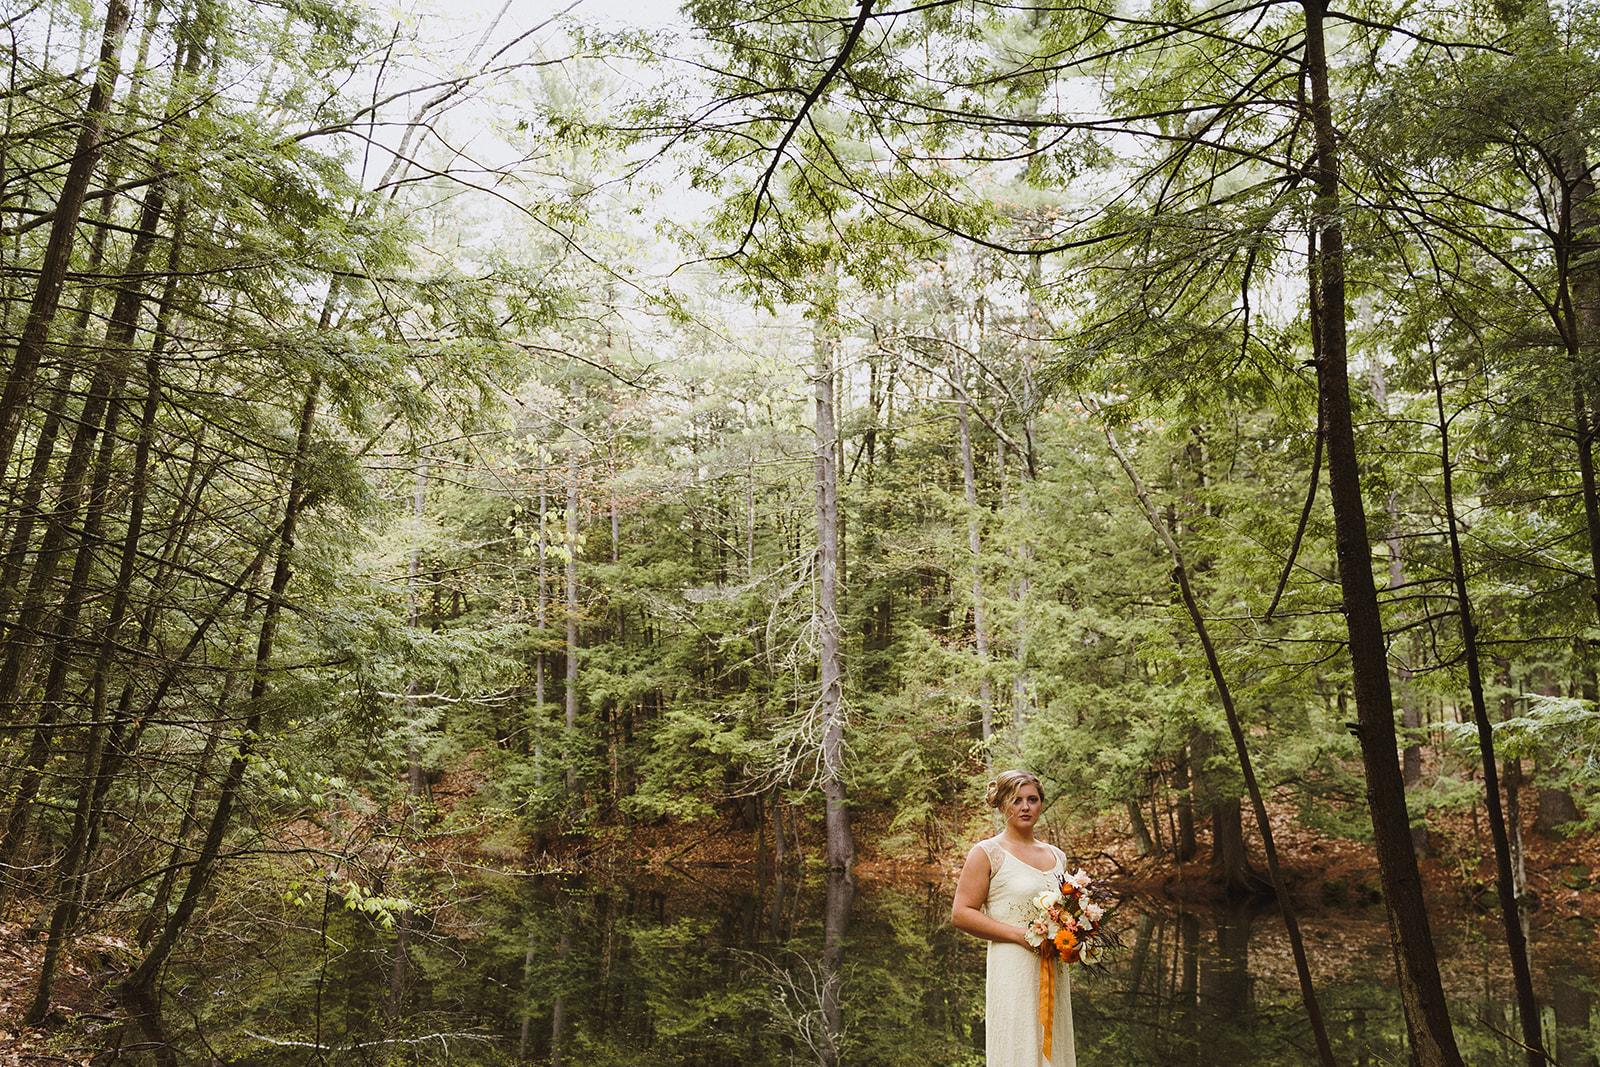 Tuckaway Tree Farm Lebanon Maine Wedding Inspiration 37